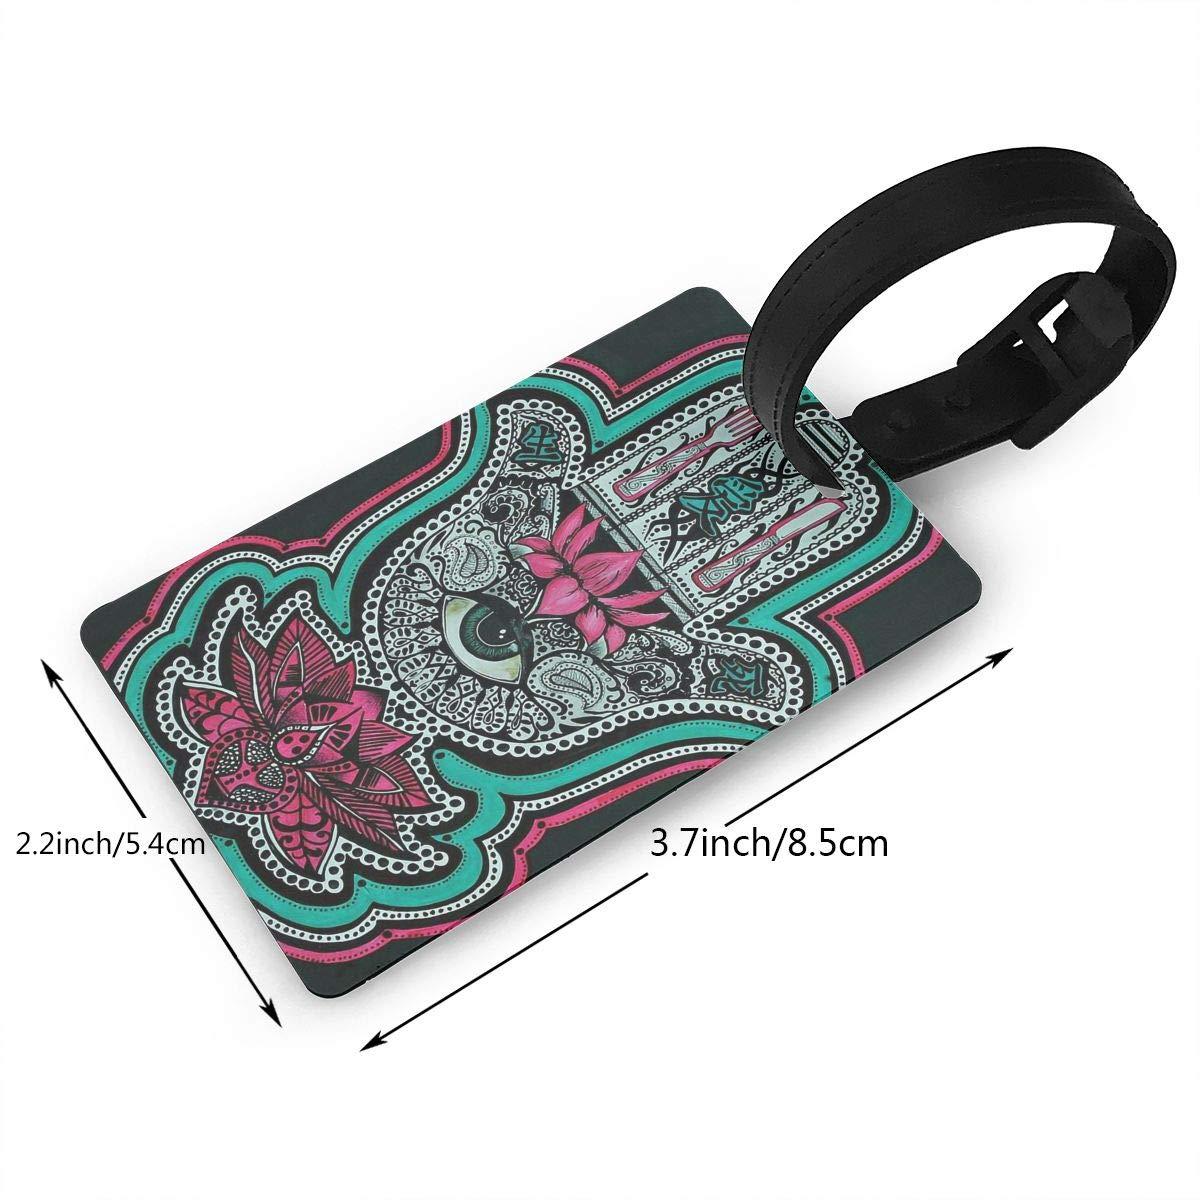 Hamsa Hand Of Fatima Handbag Tag For Travel Tags Accessories 2 Pack Luggage Tags